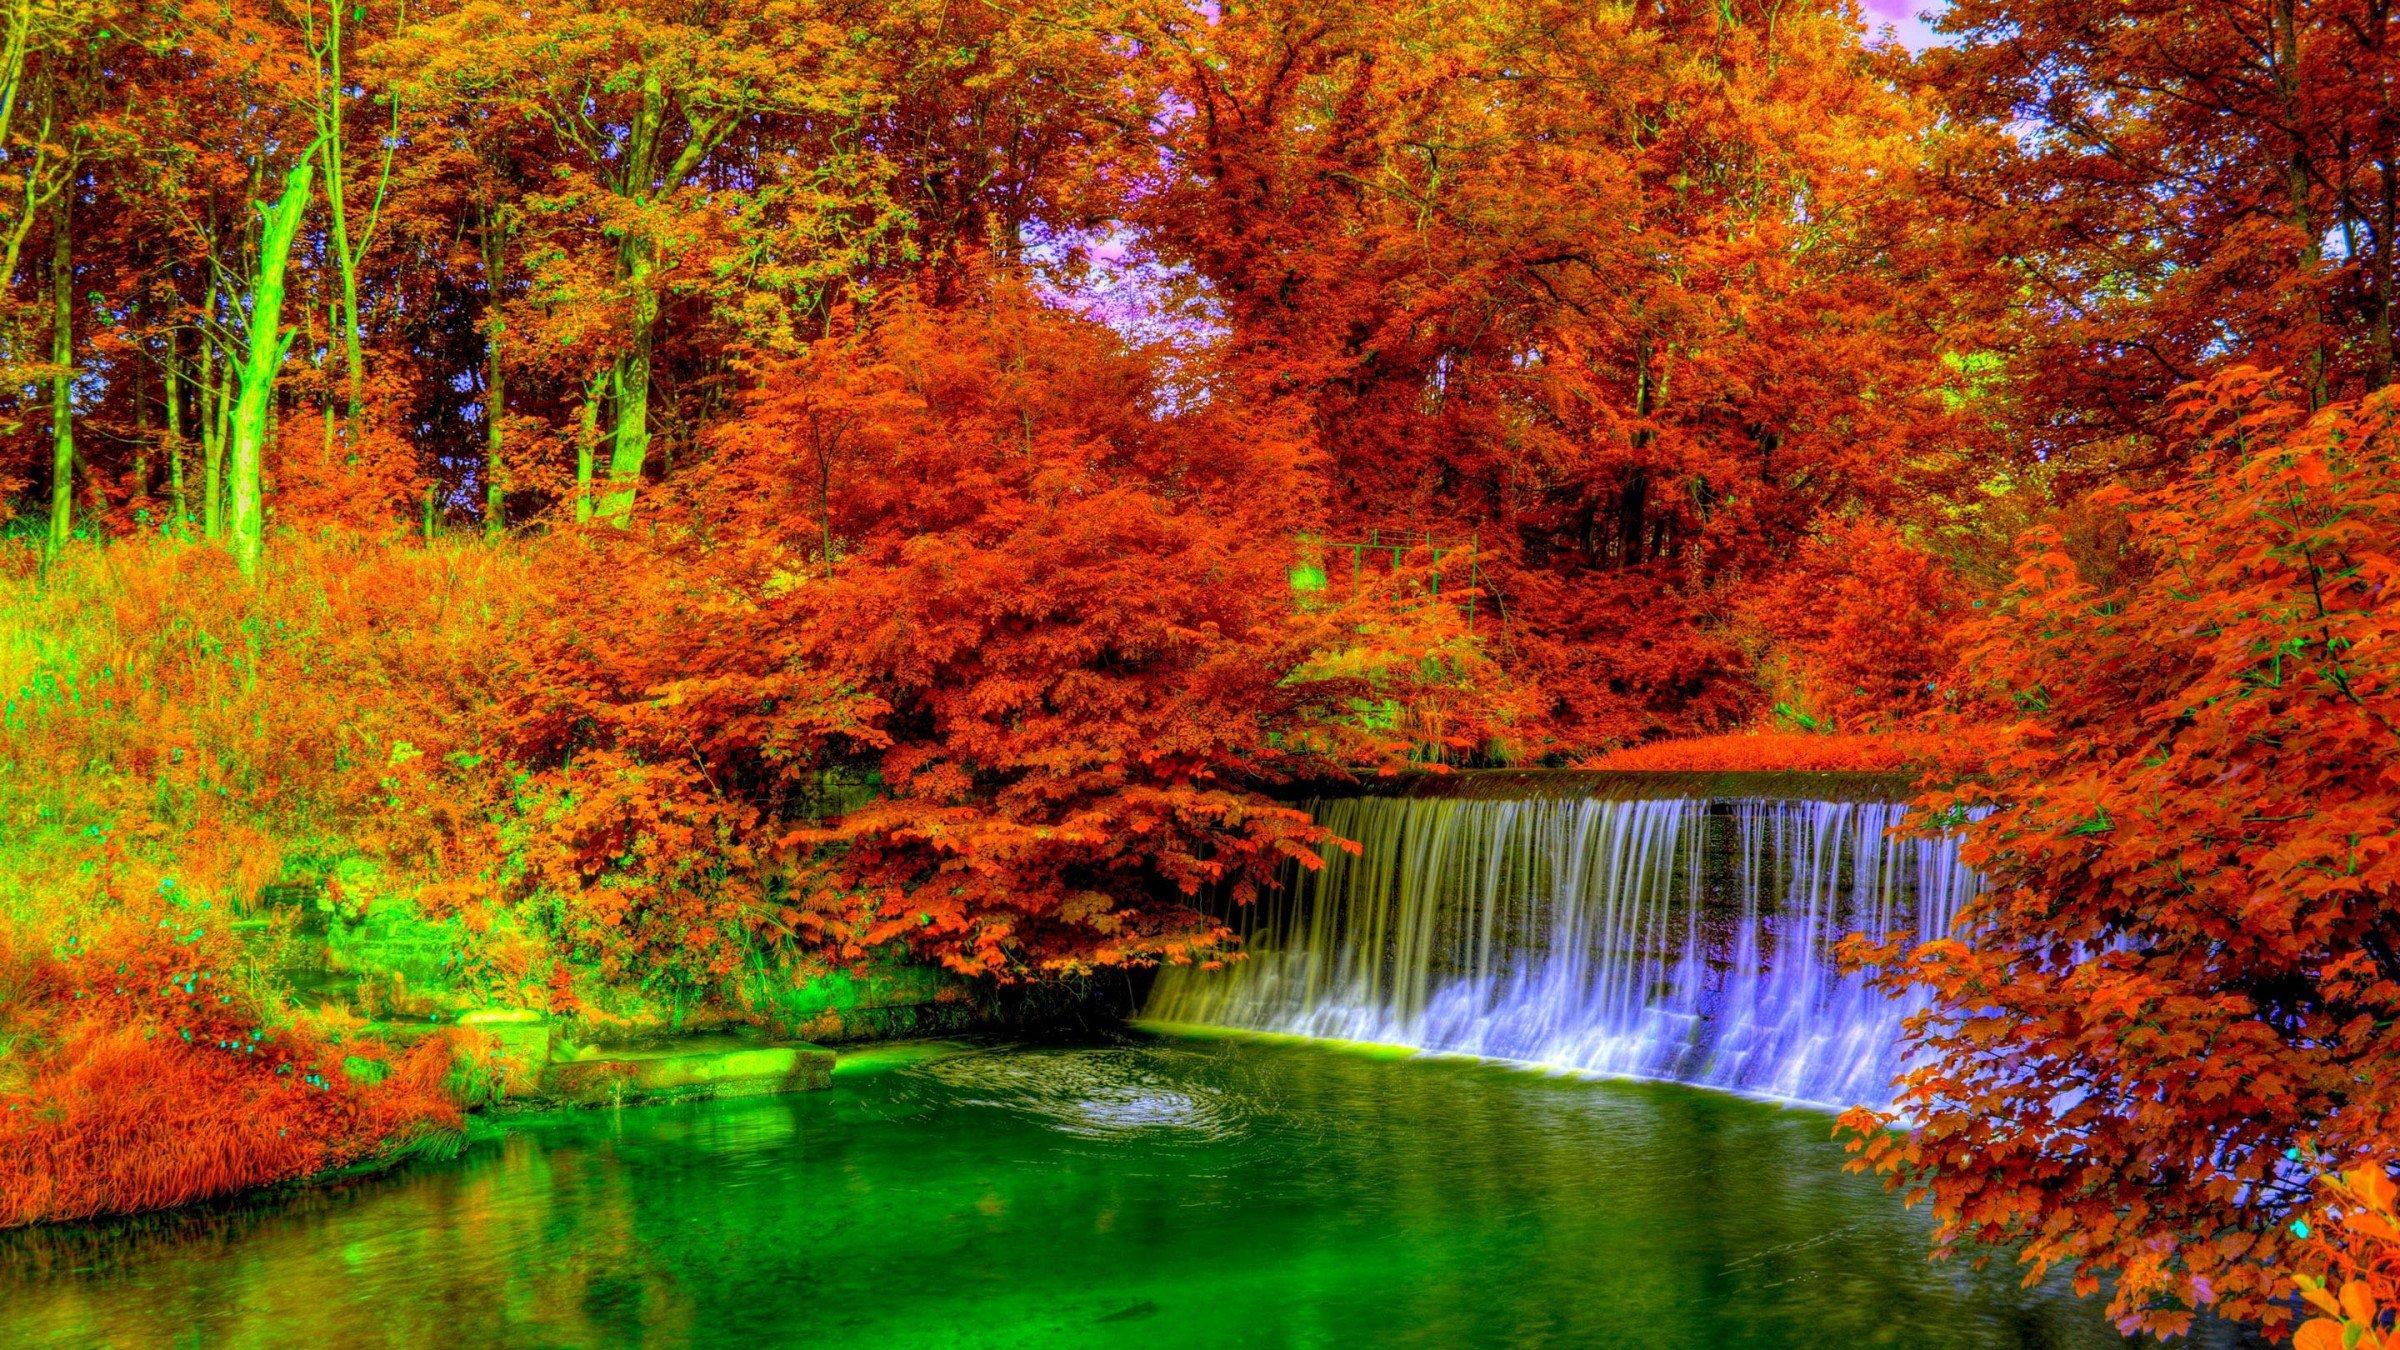 landscape nature tree litsva - photo #9